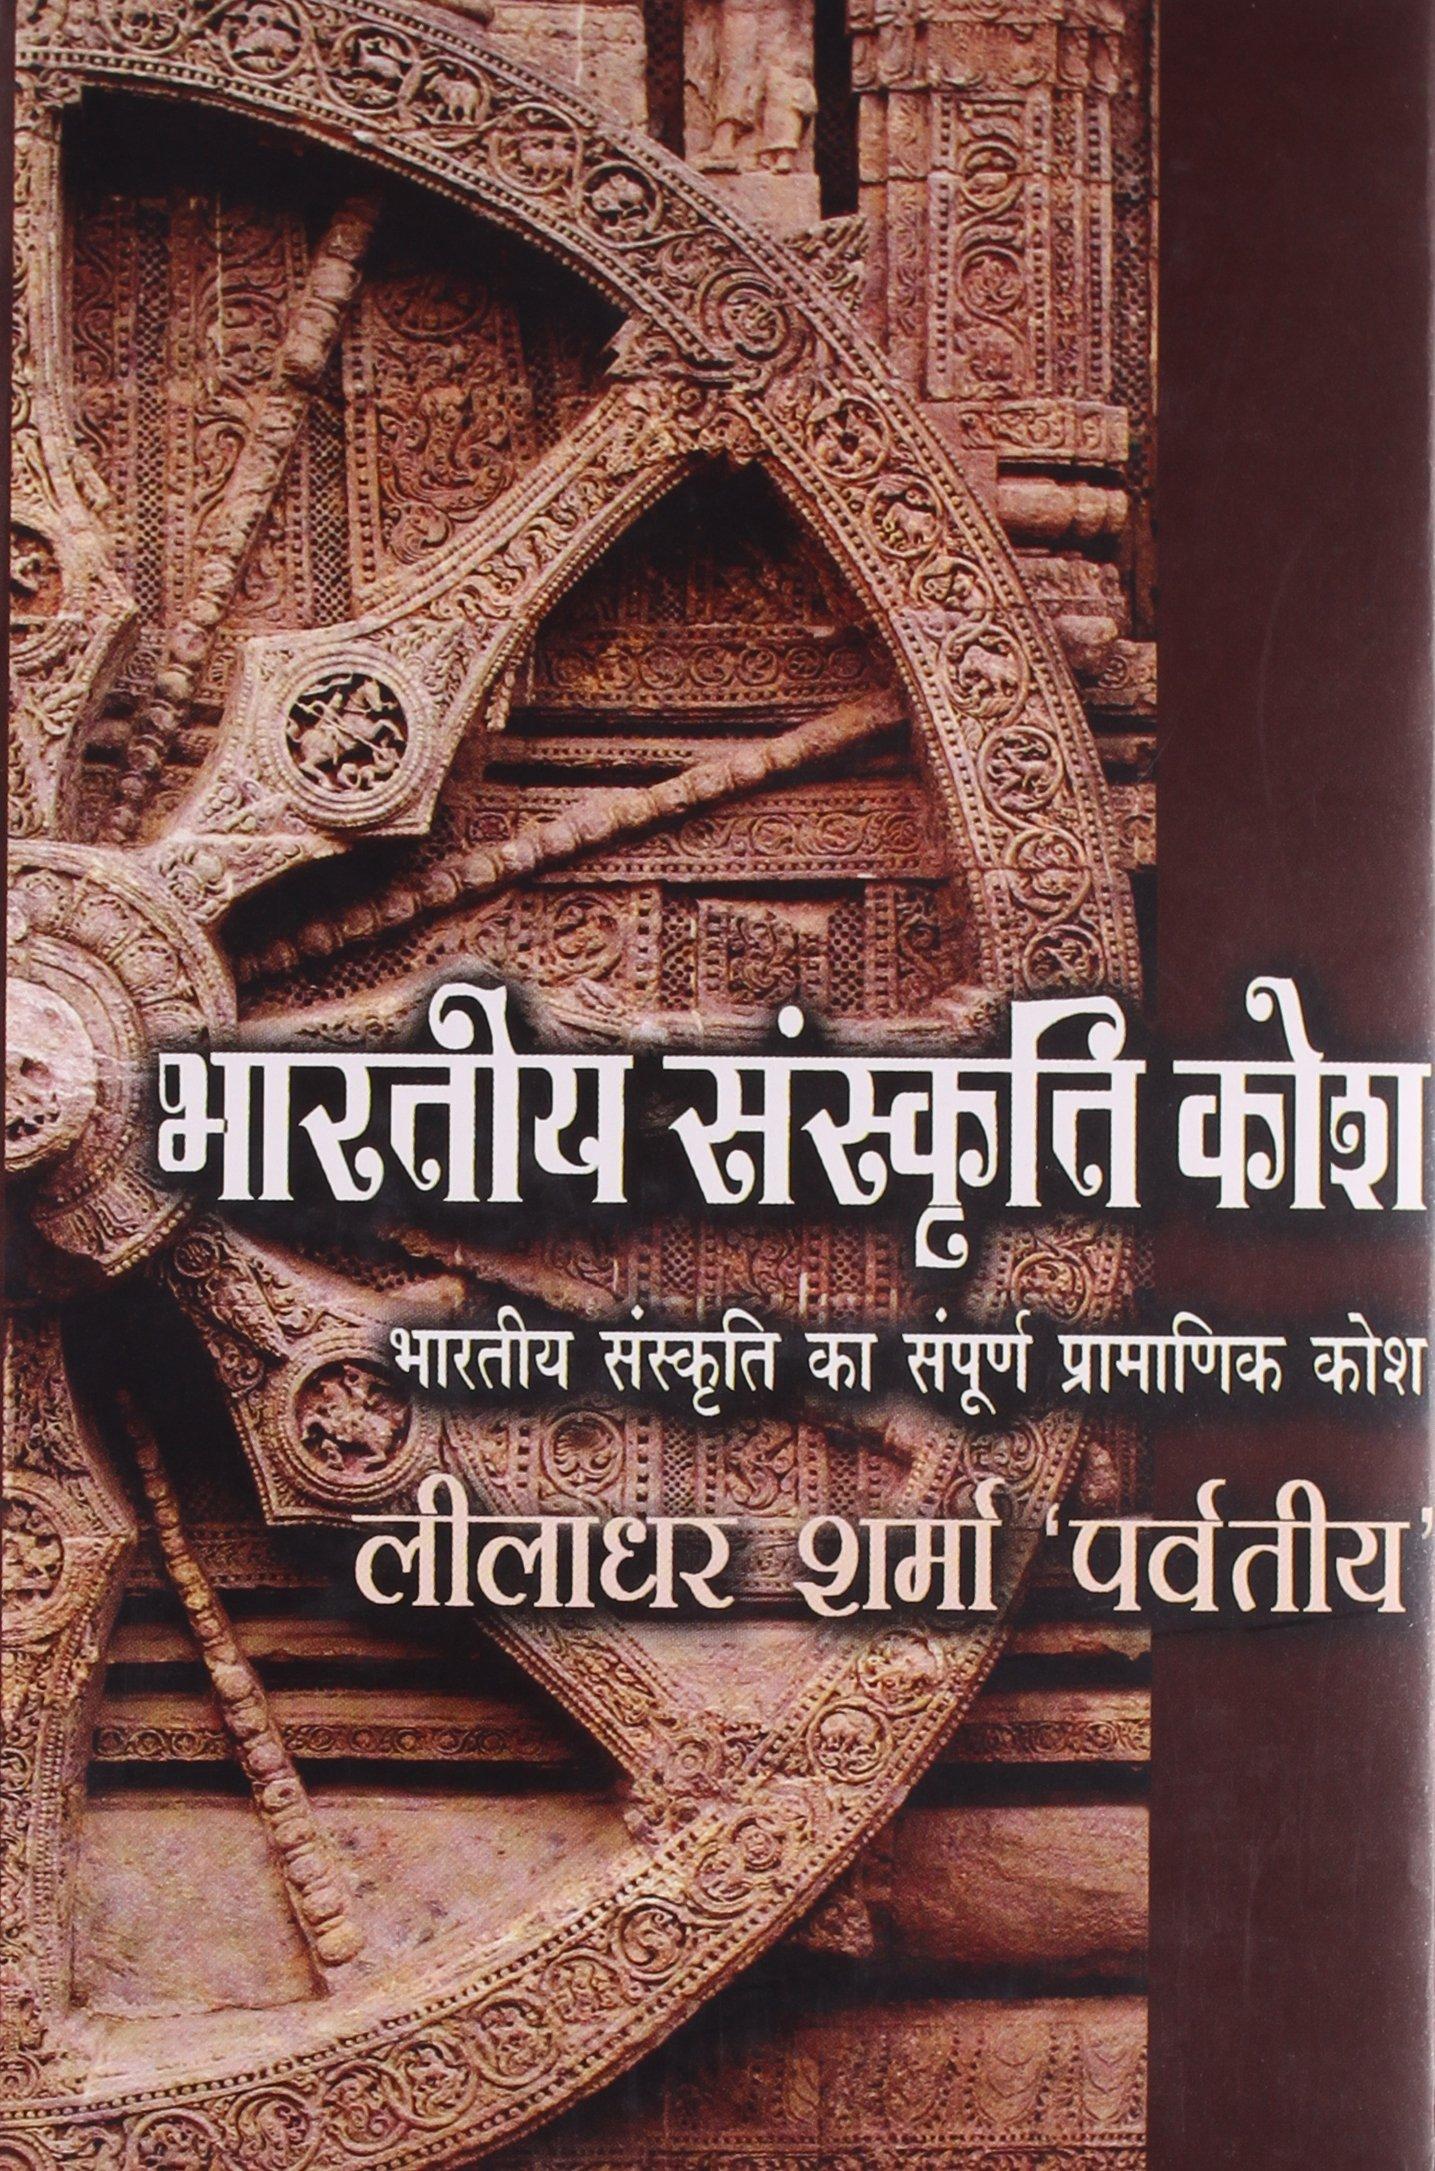 Buy Bhartiya Sanskriti Kosh Book Online at Low Prices in India | Bhartiya  Sanskriti Kosh Reviews & Ratings - Amazon.in